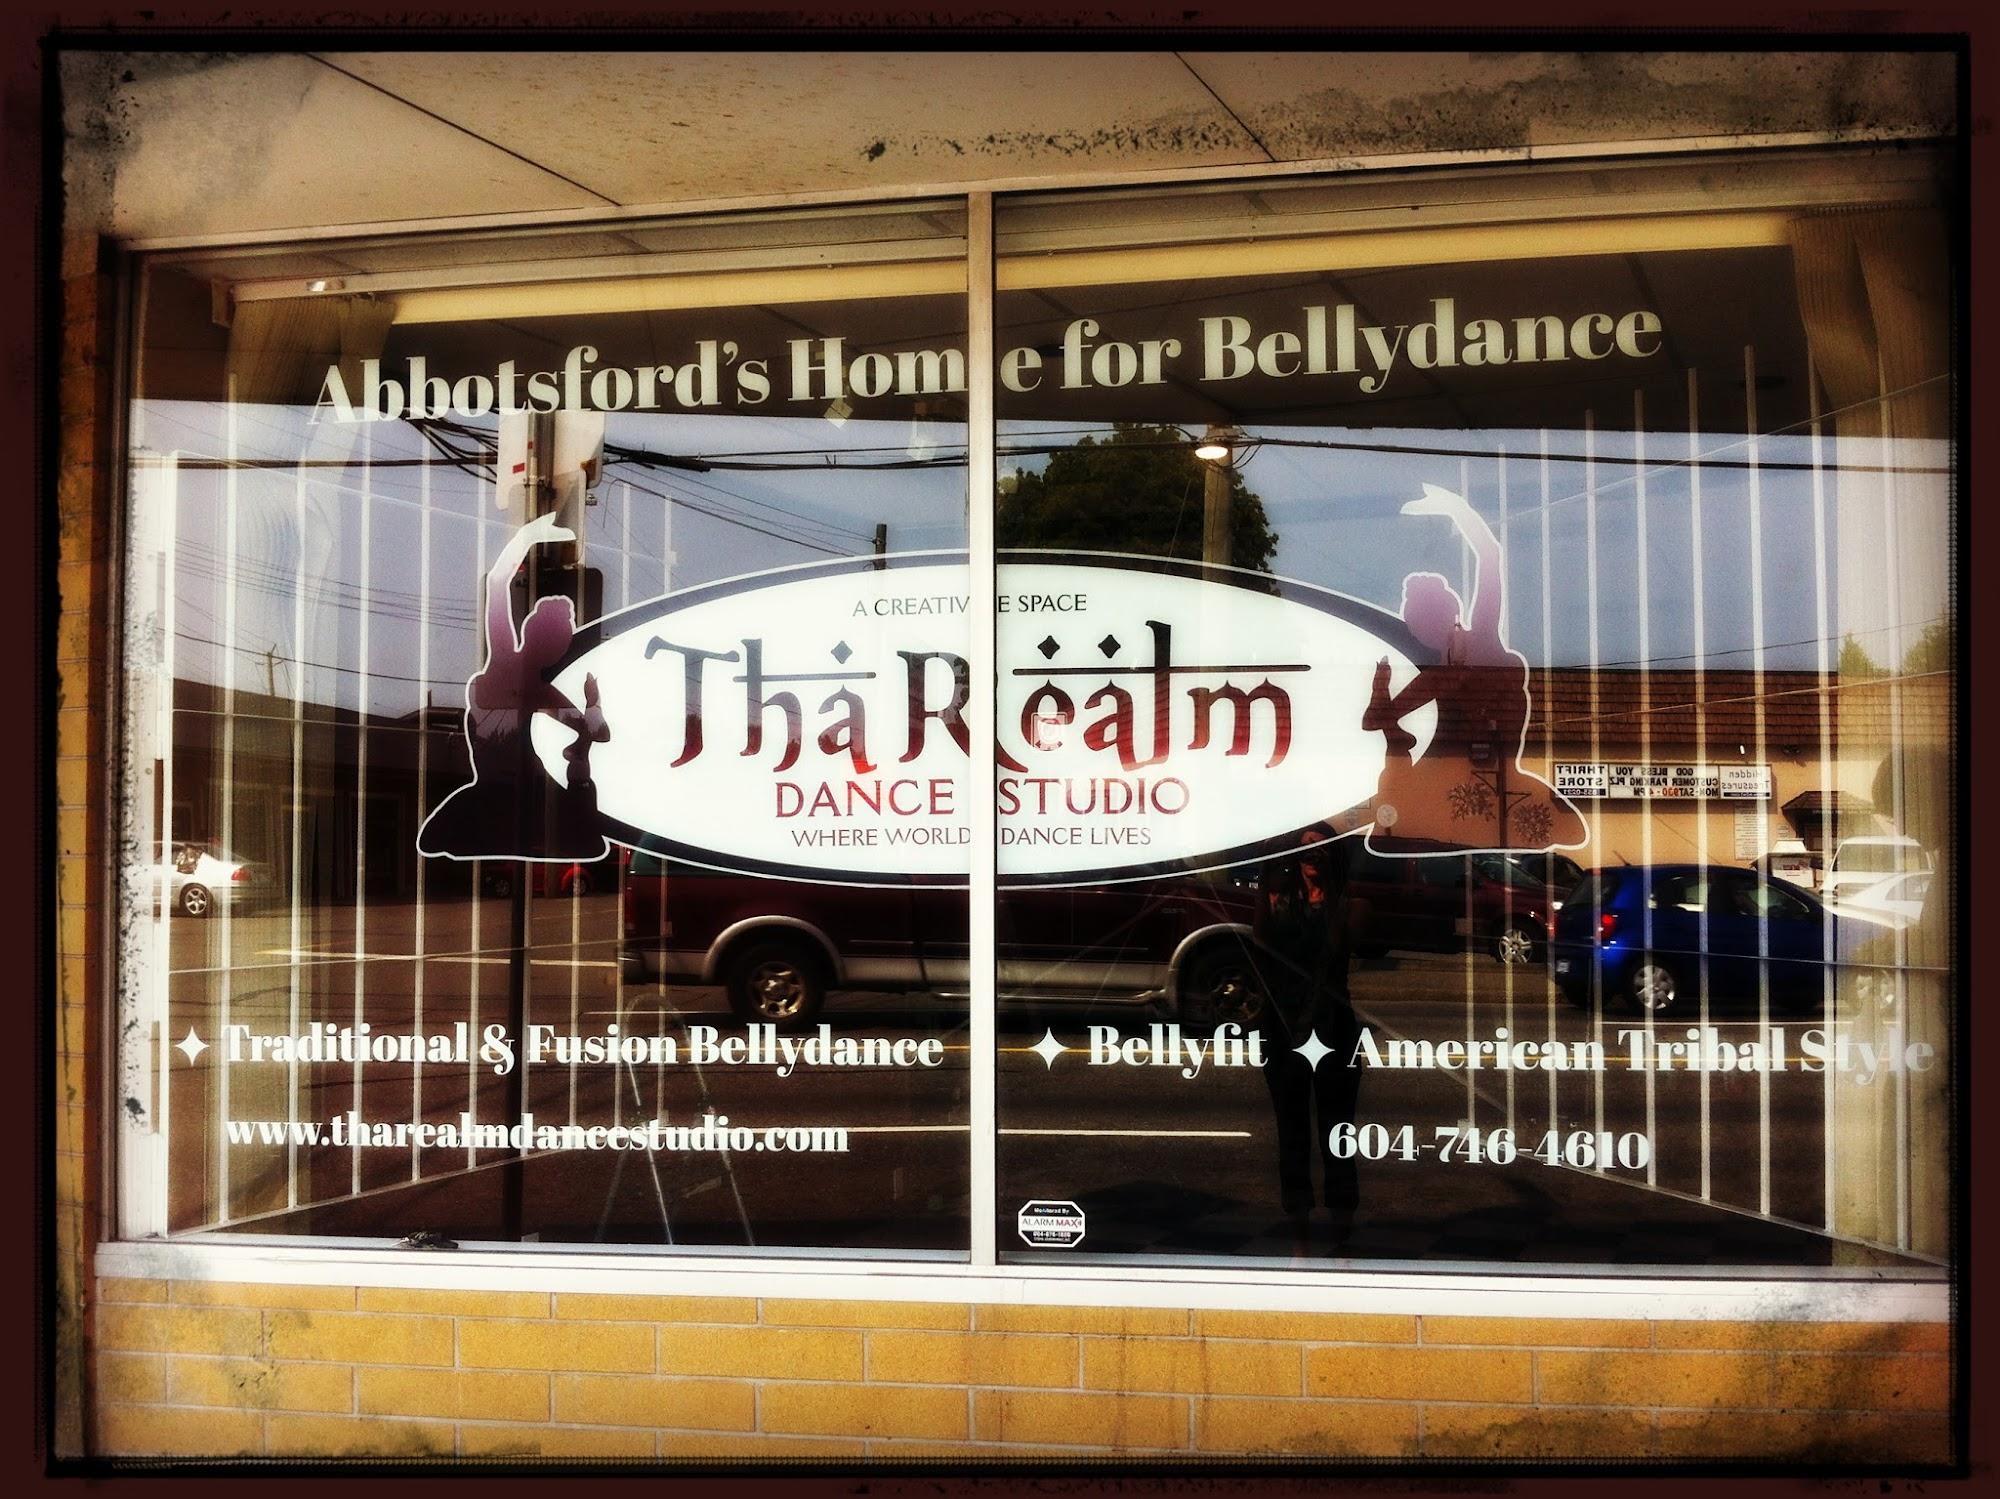 Tha Realm Dance Studio 33788 George Ferguson Way, Abbotsford